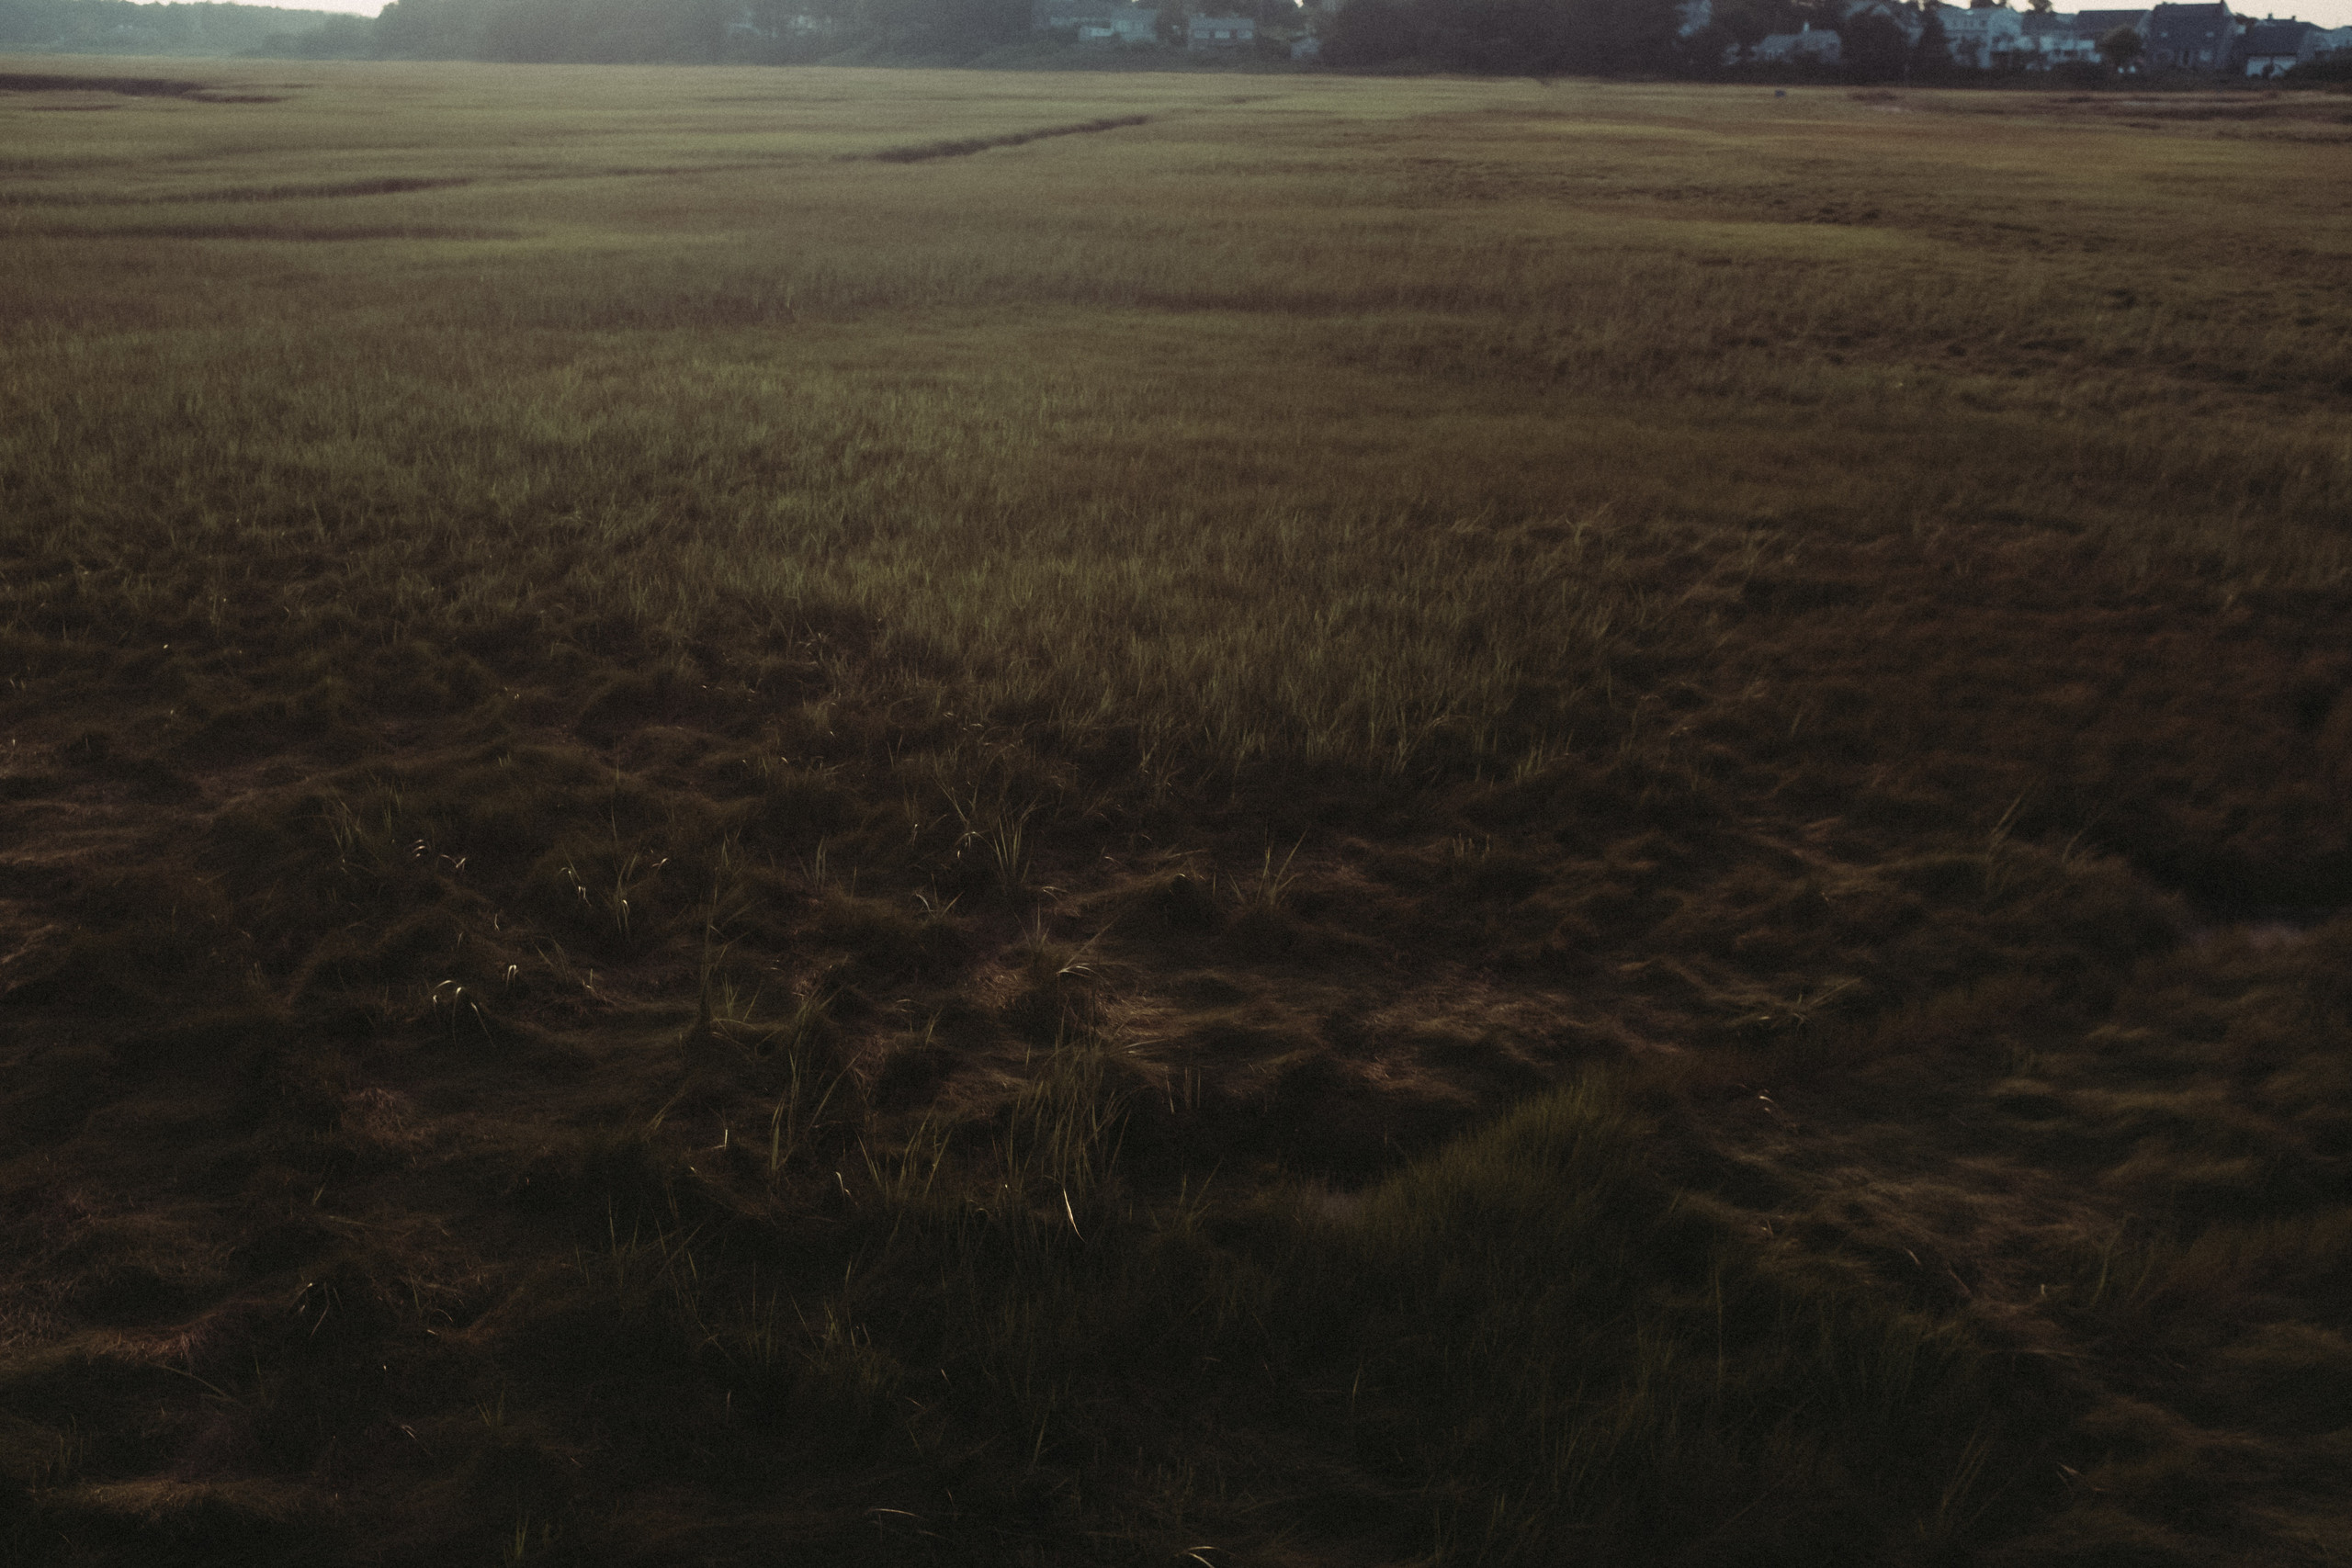 Grass in a marshy bog.